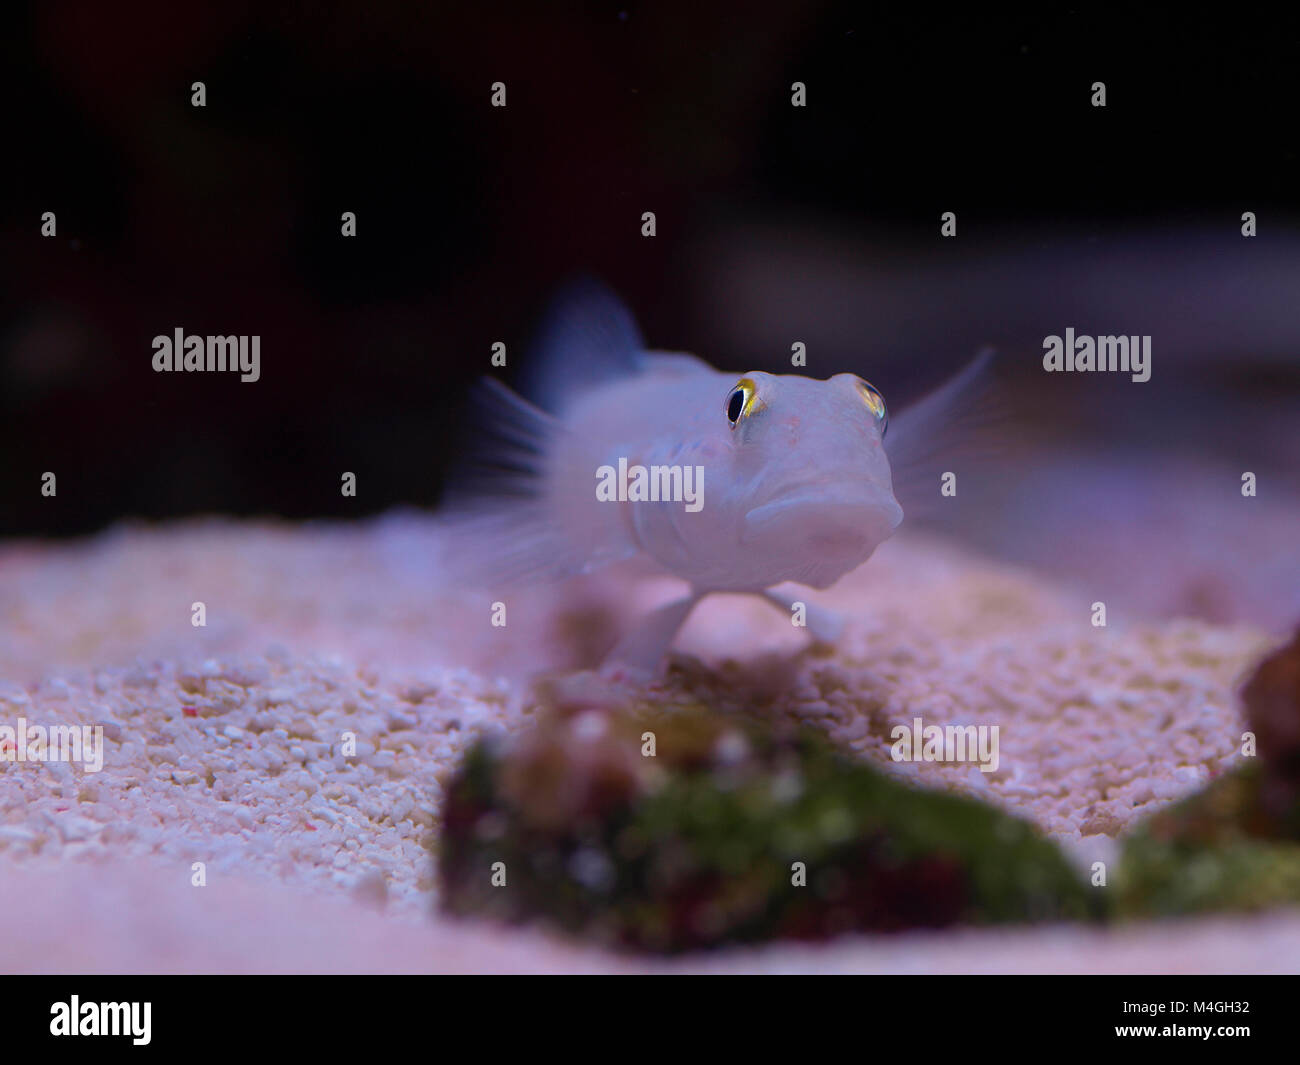 Close up macro shot of a marine chalk or sand sifting goby fish - Stock Image